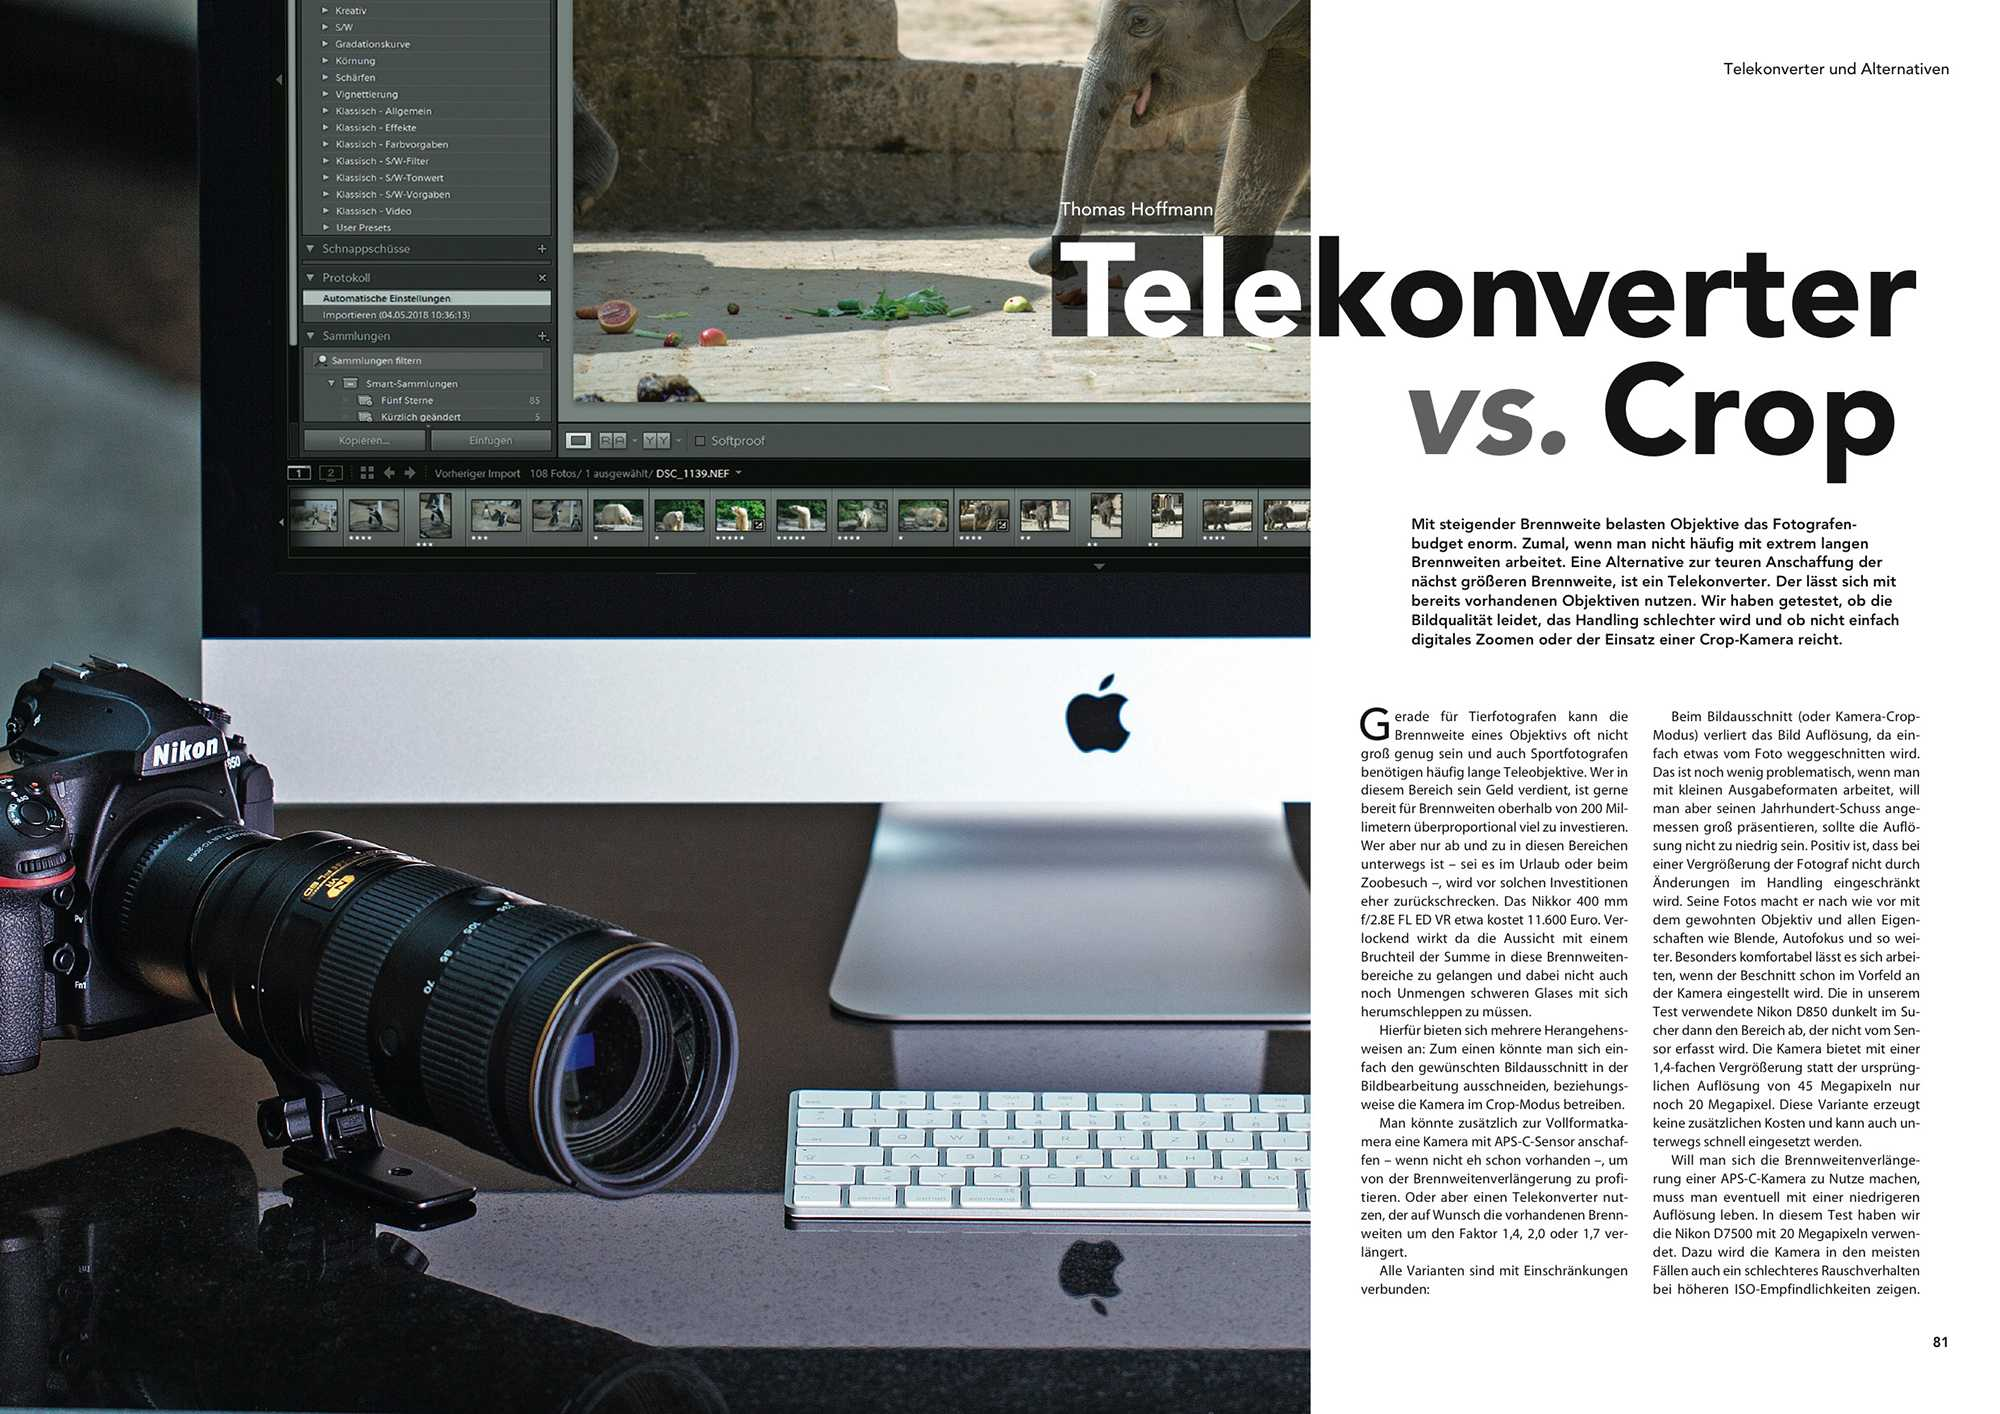 Telekonverter oder Crop-Kamera